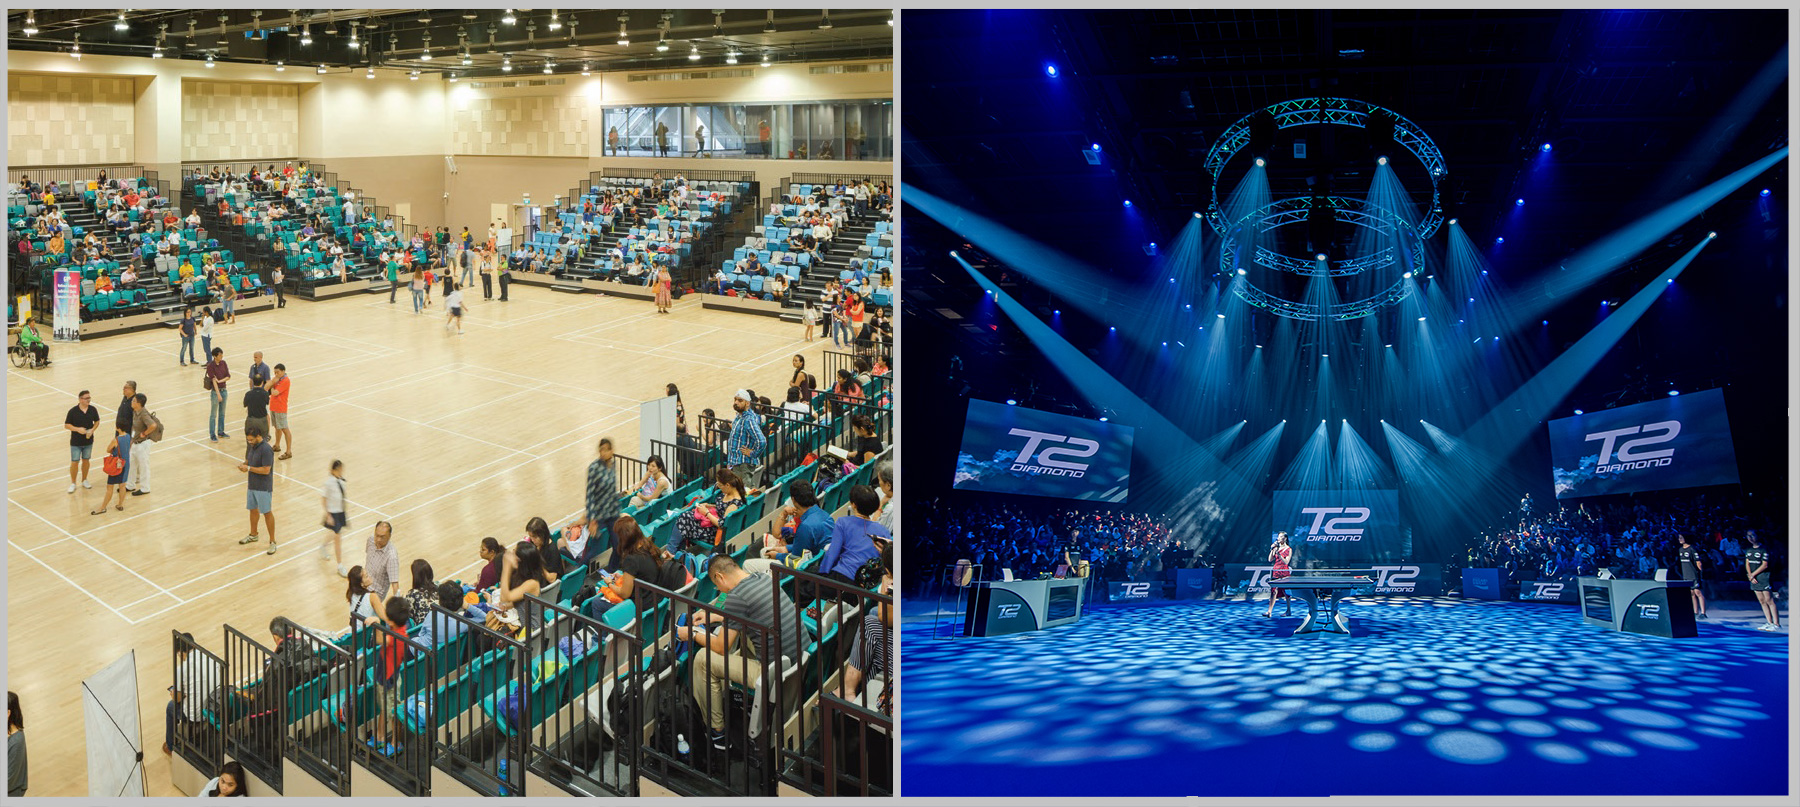 Sports Hall transform into the T2Cavern